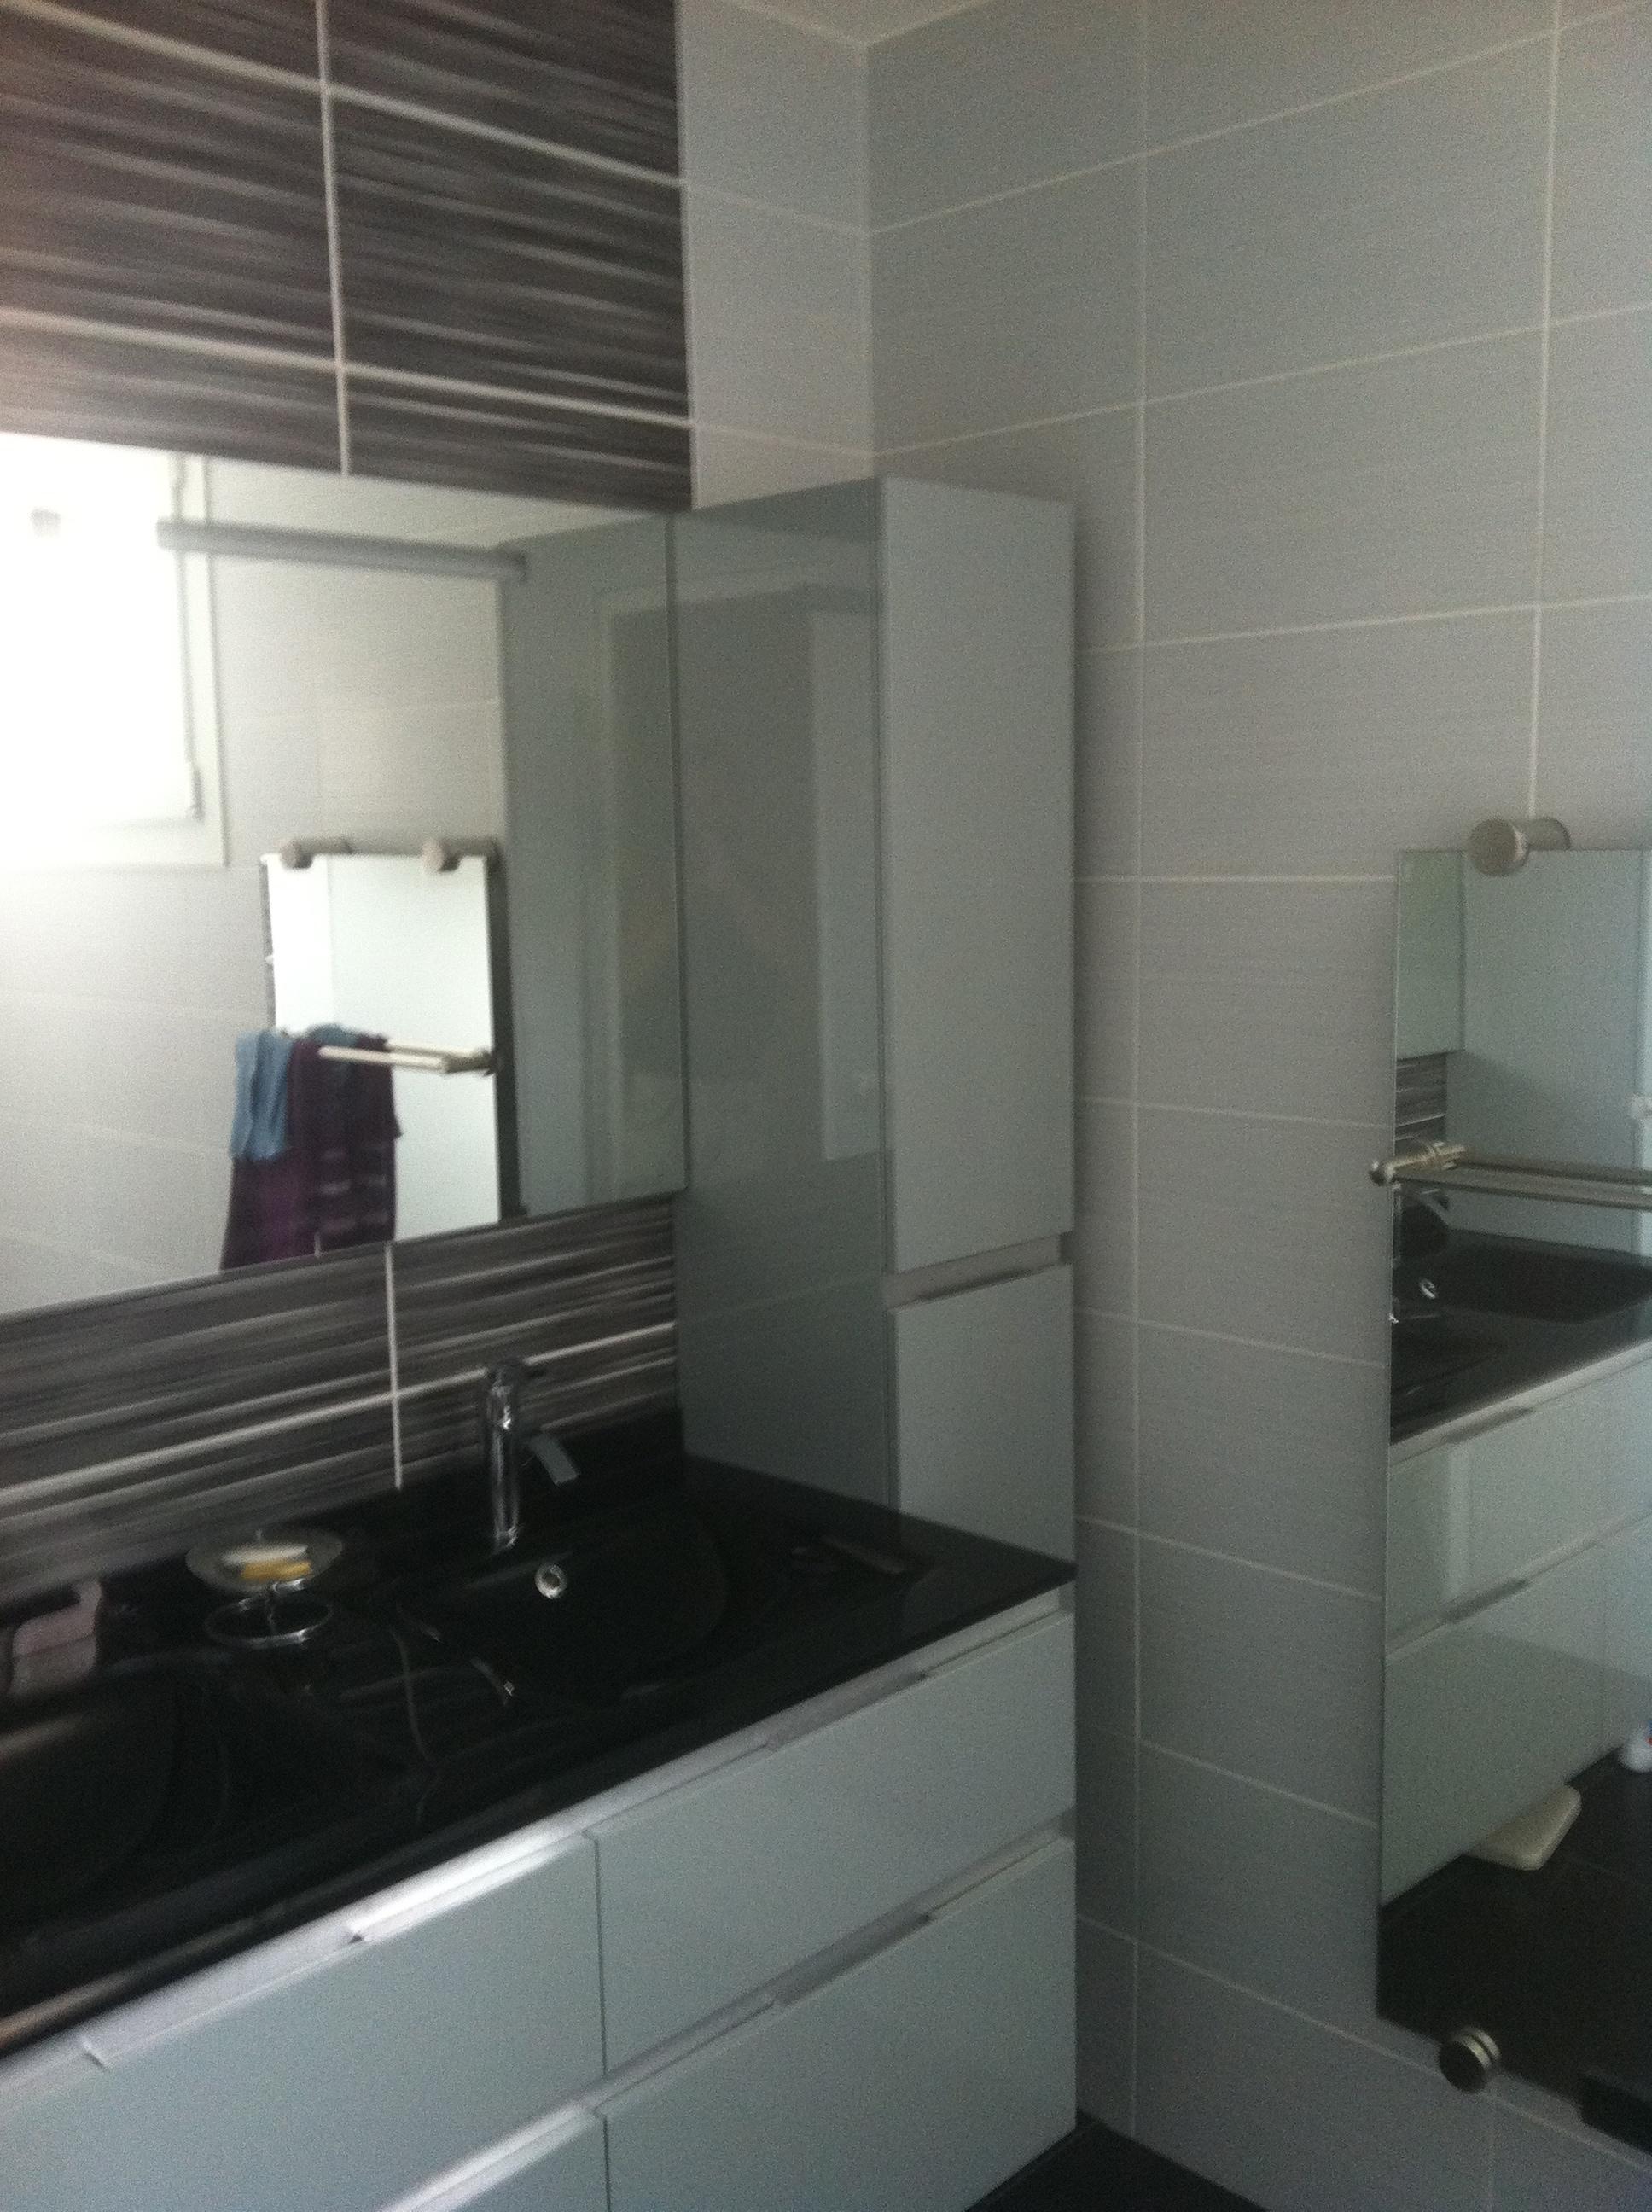 2012/06 Salle de bain sur Marseille Salle de bains avec miroir ...